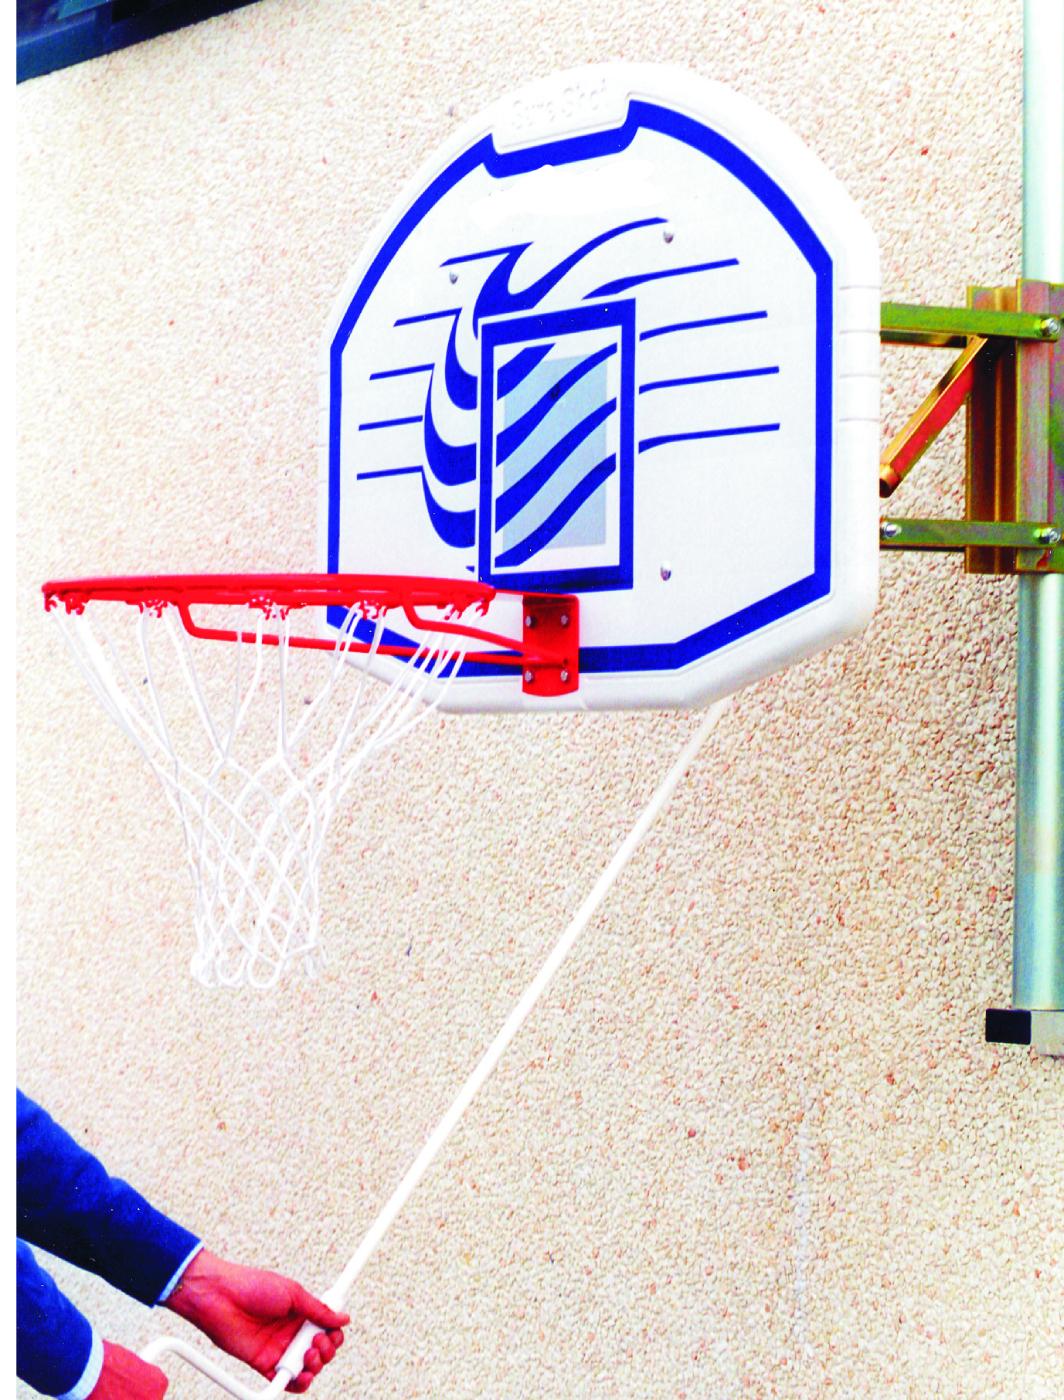 Consola baschet minibaschet cu fixare pe perete